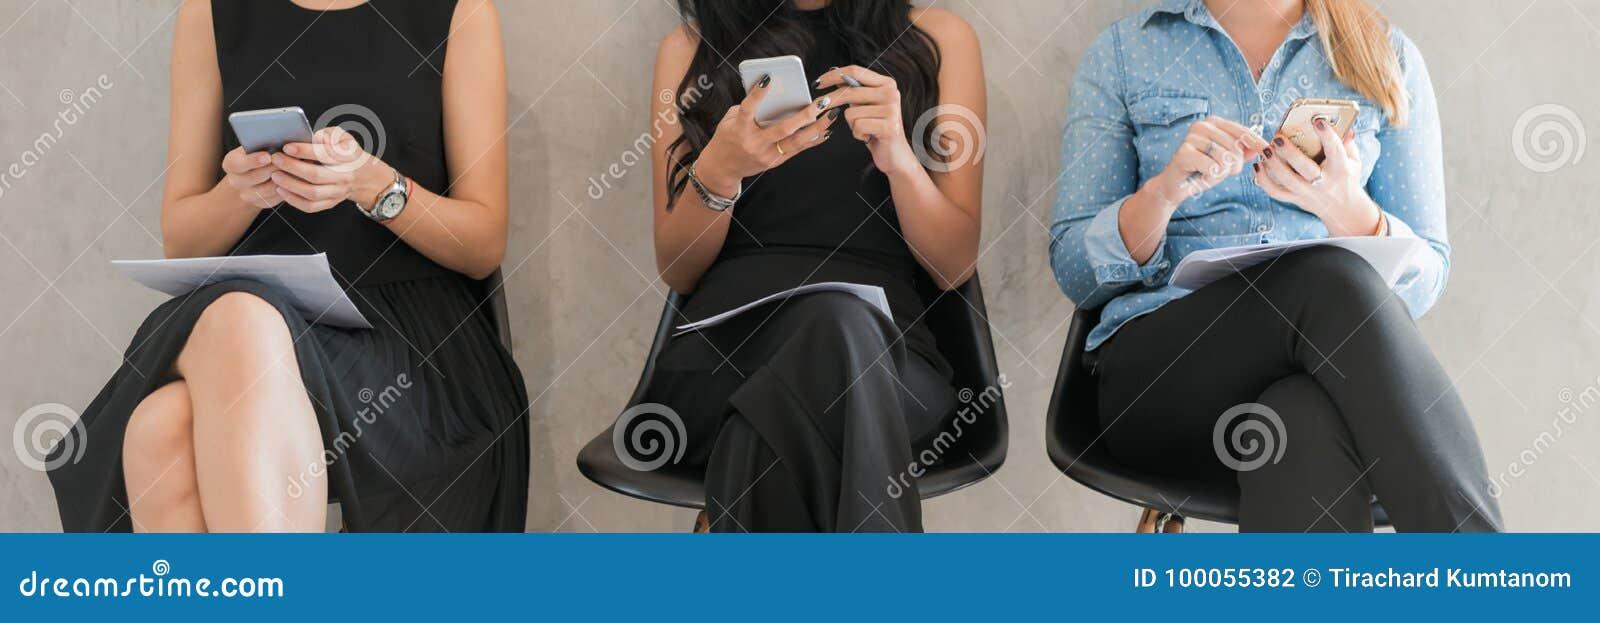 Group adult hipsters friends sitting sofa using modern gadgets. Business startup friendship teamwork concept